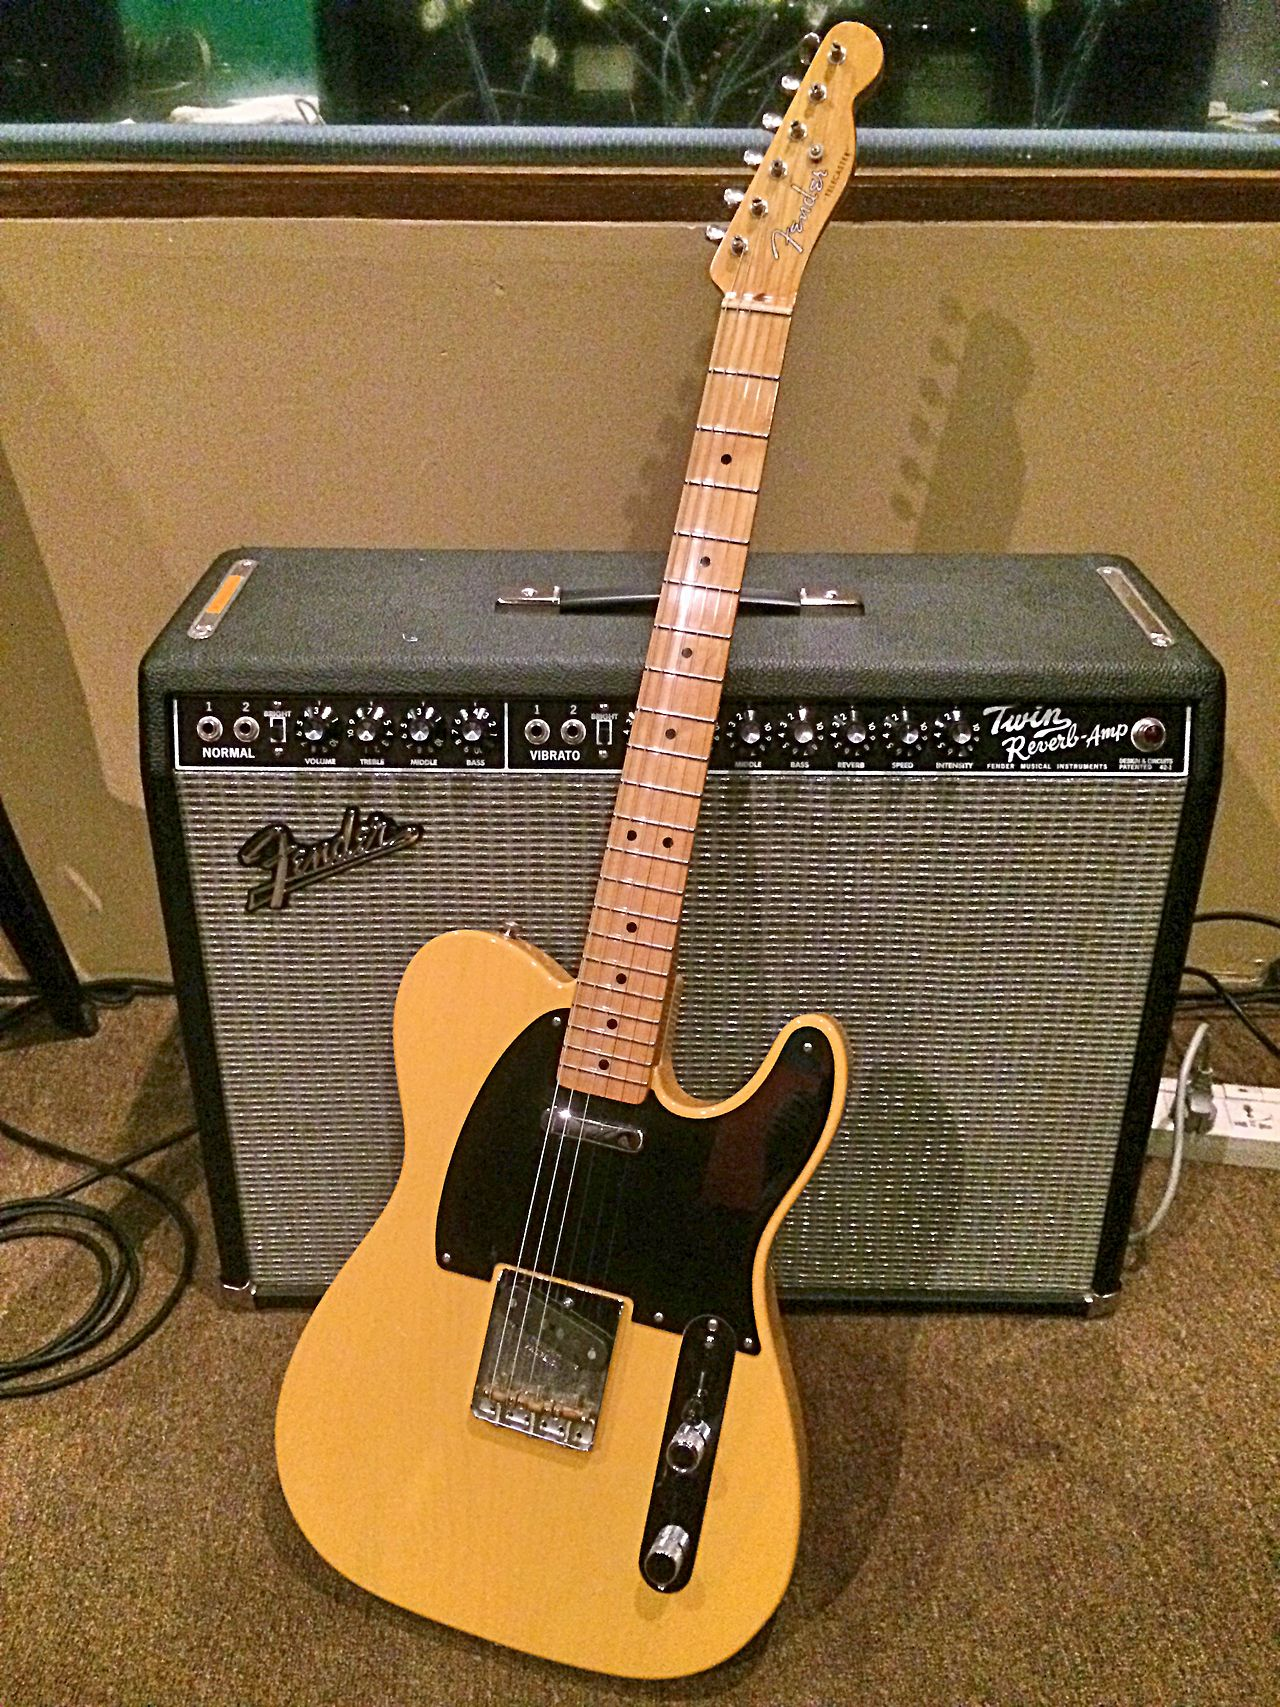 Fender Baja Telecaster Shared By The Lewis Hamilton Band Https Www Facebook Com Lewishamiltonb Telecaster Guitar Fender Telecaster Fender Baja Telecaster